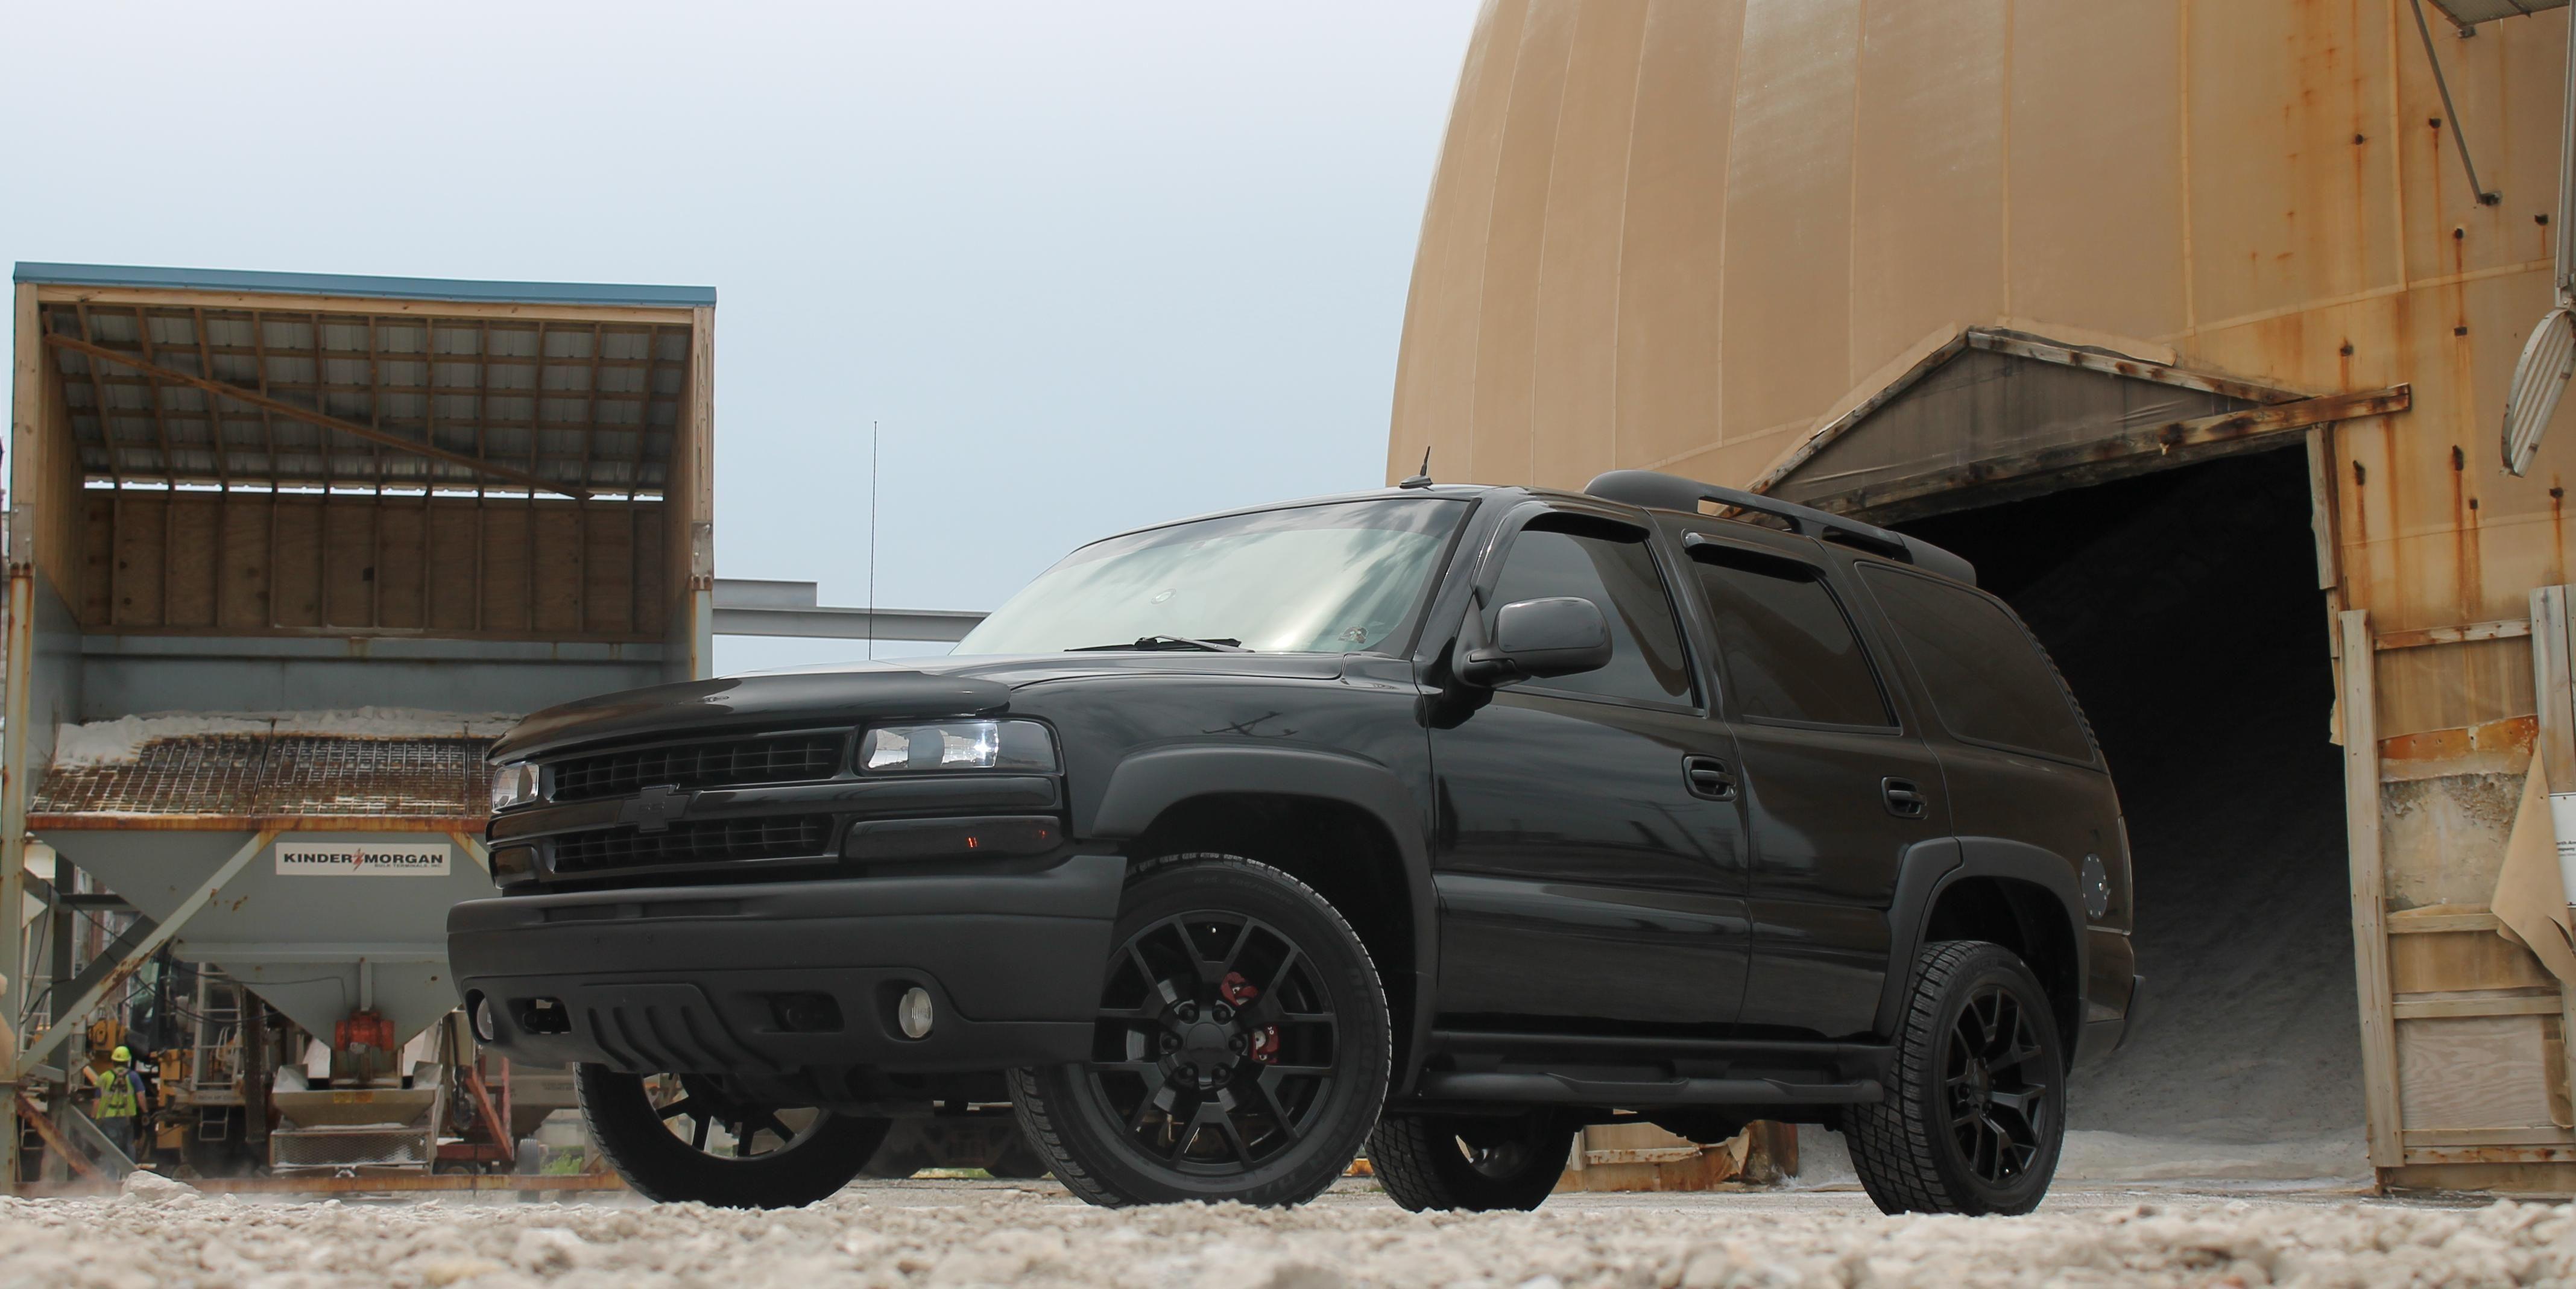 RedneckRambo45 2005 Chevrolet Tahoe  Trucks  Pinterest